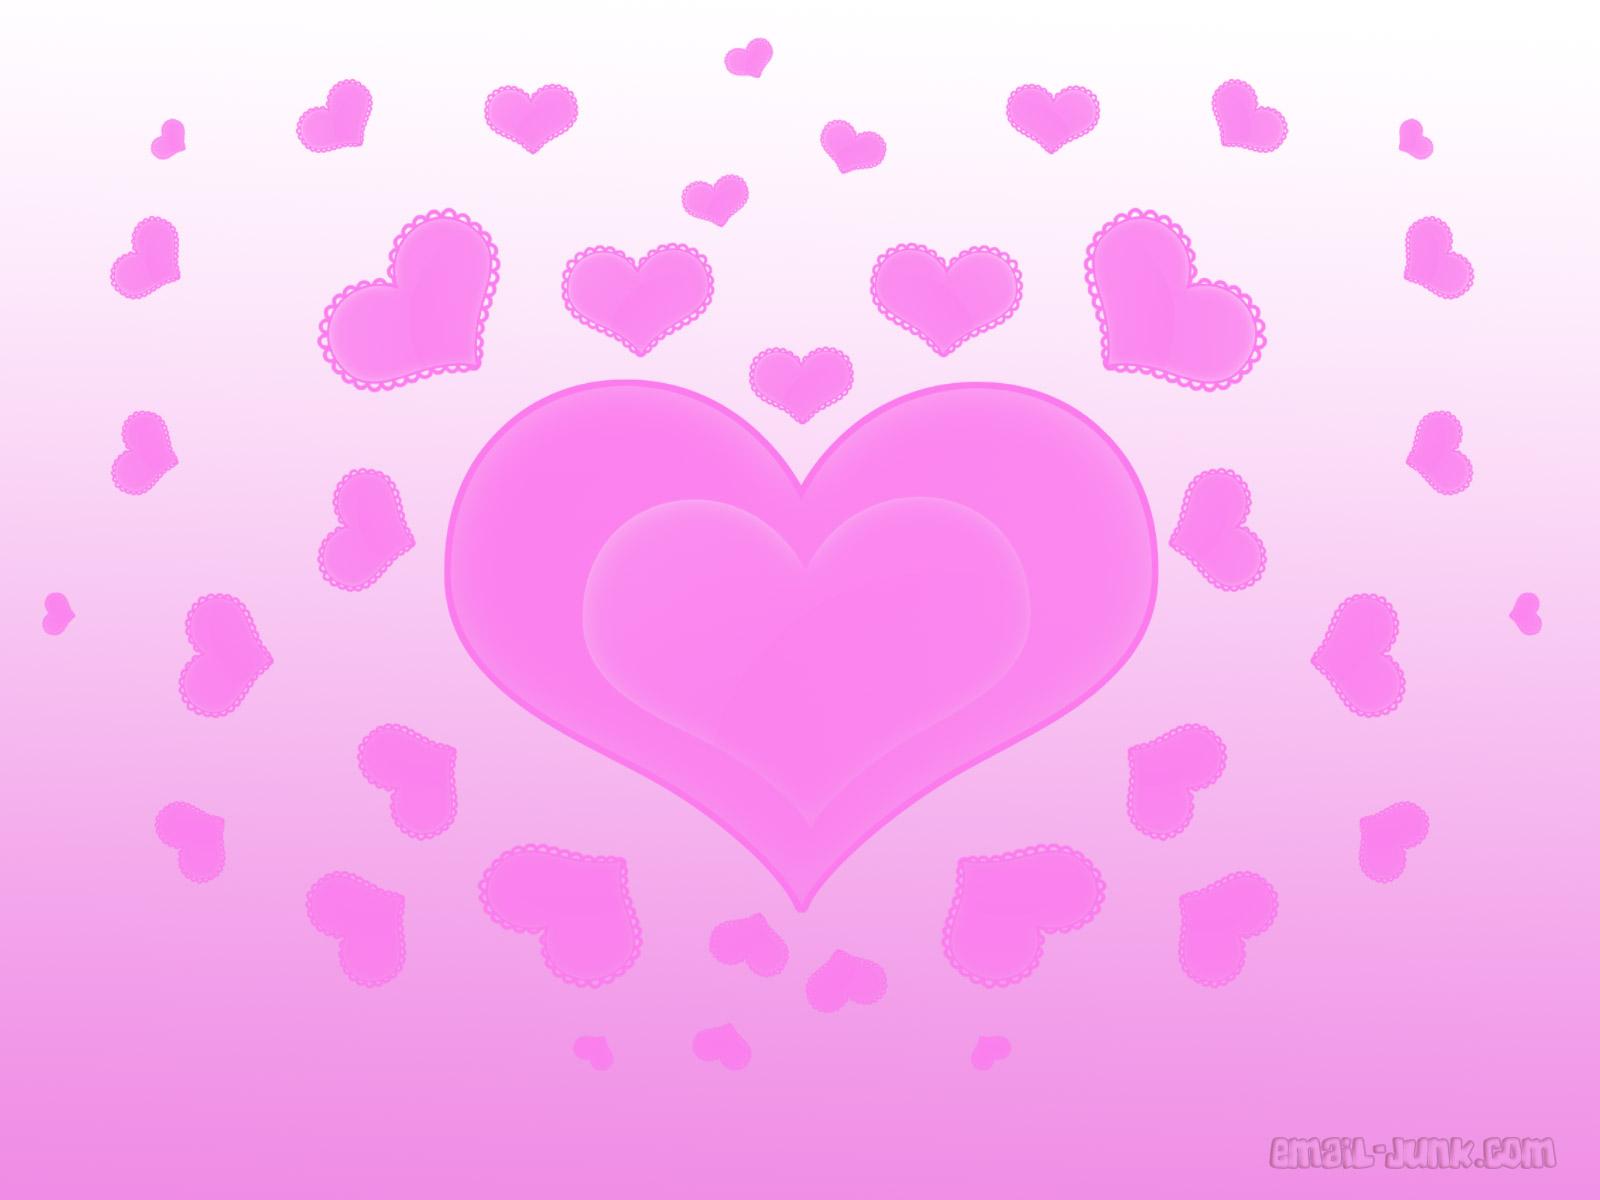 pink-hearts-wallpaper-1600